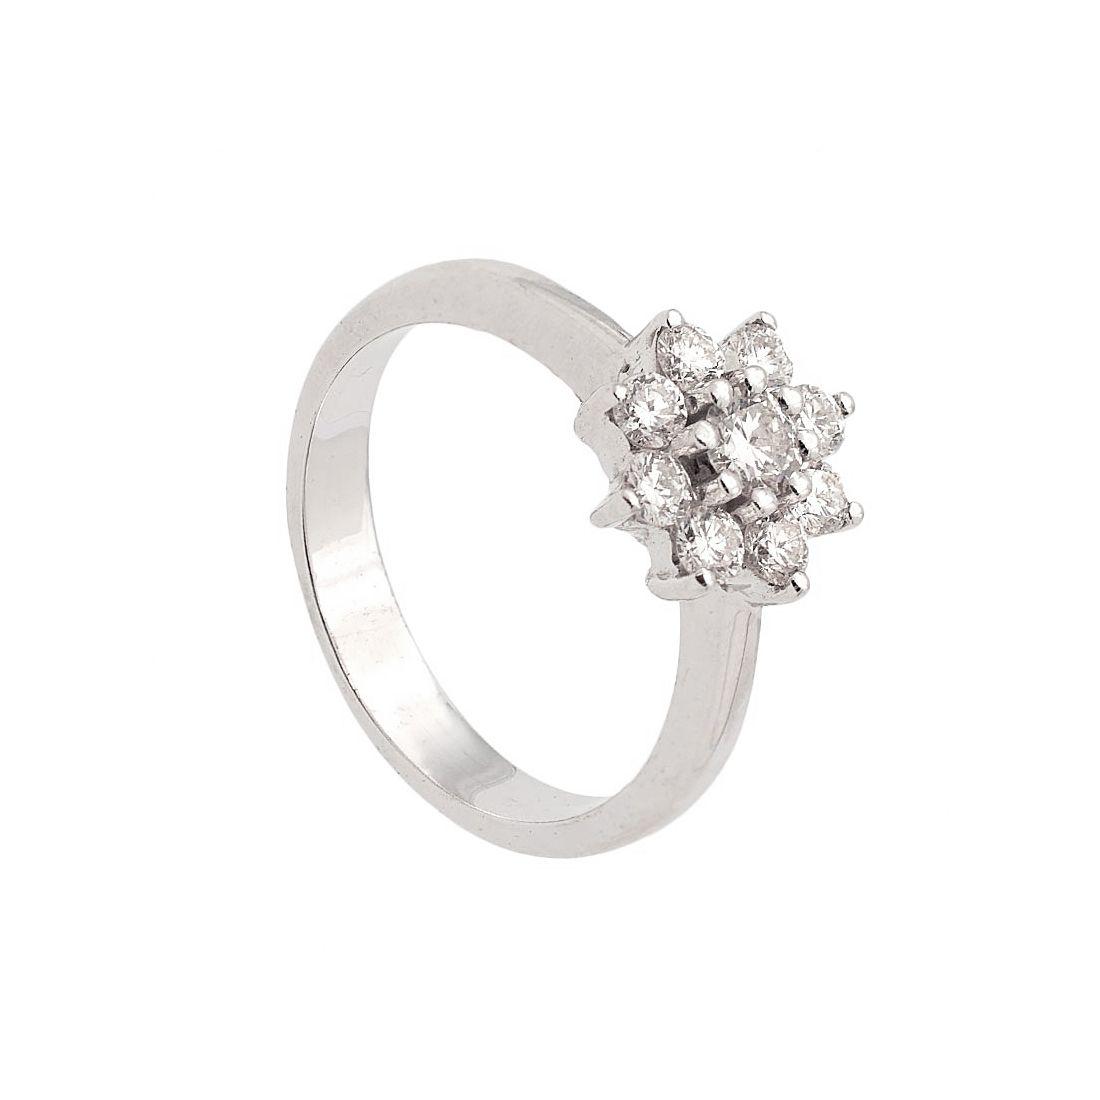 Sortija de oro blanco y diamantes  - 1